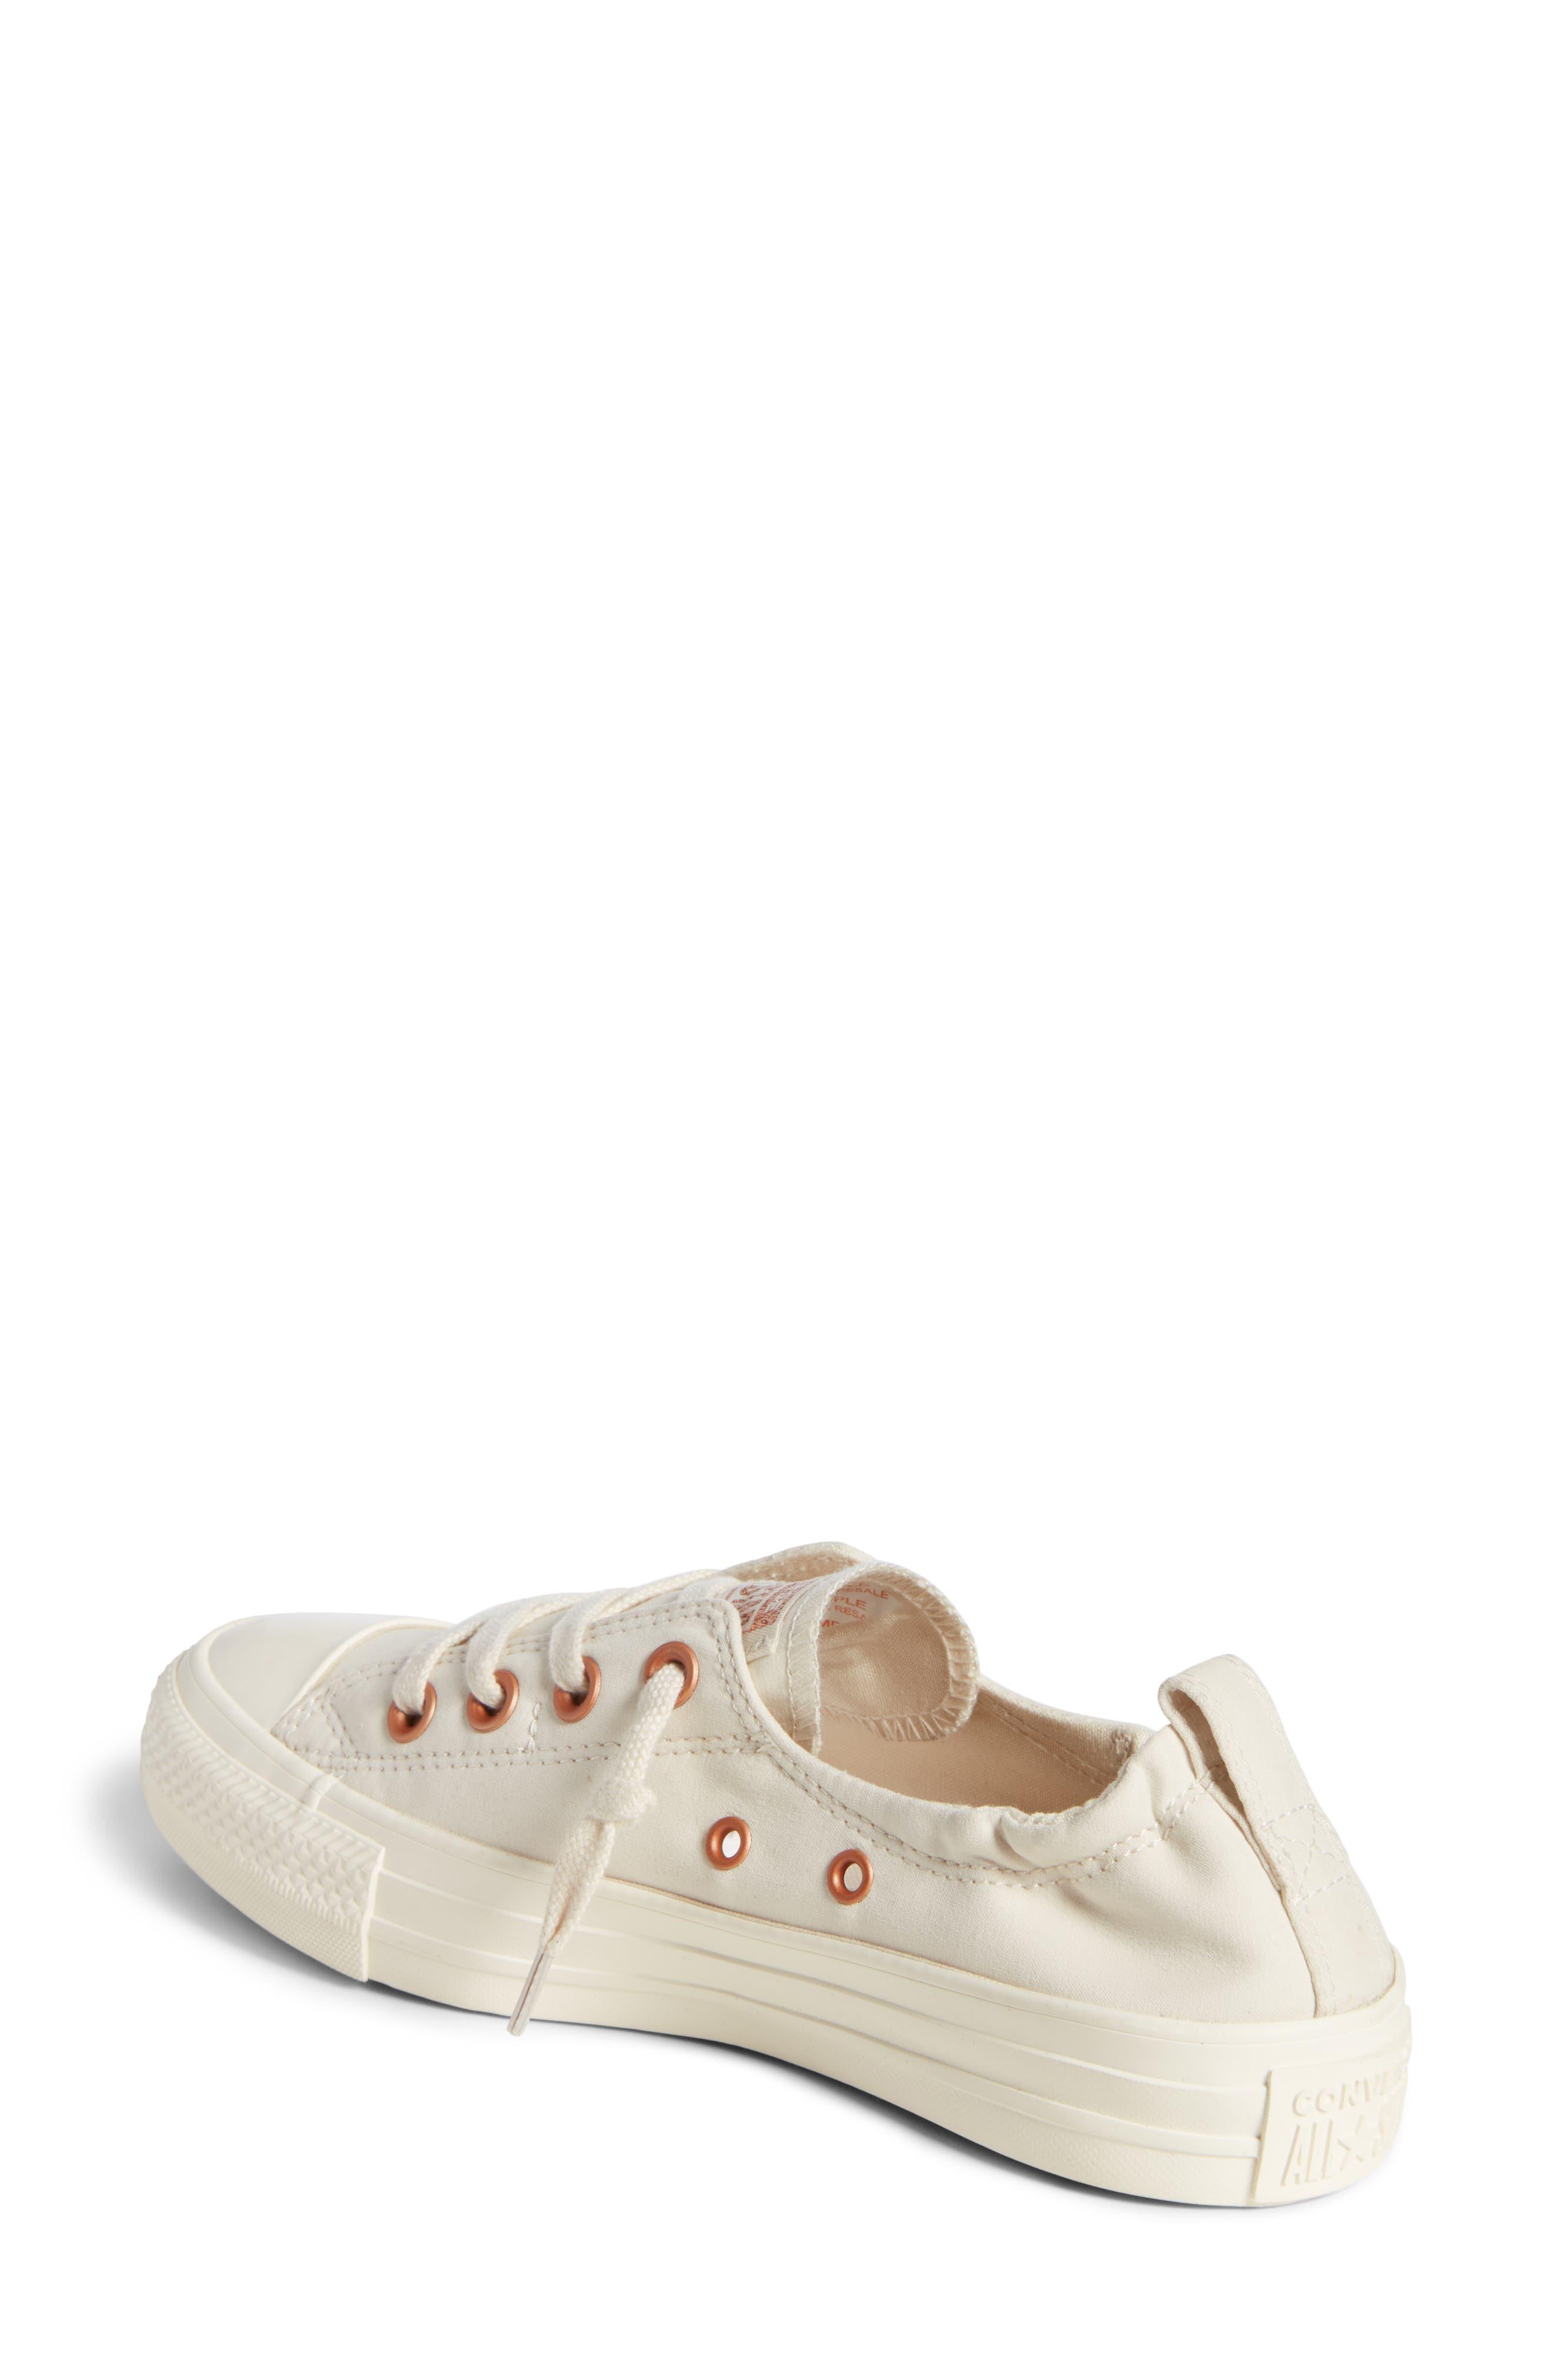 Chuck Taylor<sup>®</sup> 'Shoreline' Sneaker,                             Alternate thumbnail 2, color,                             Light Twine